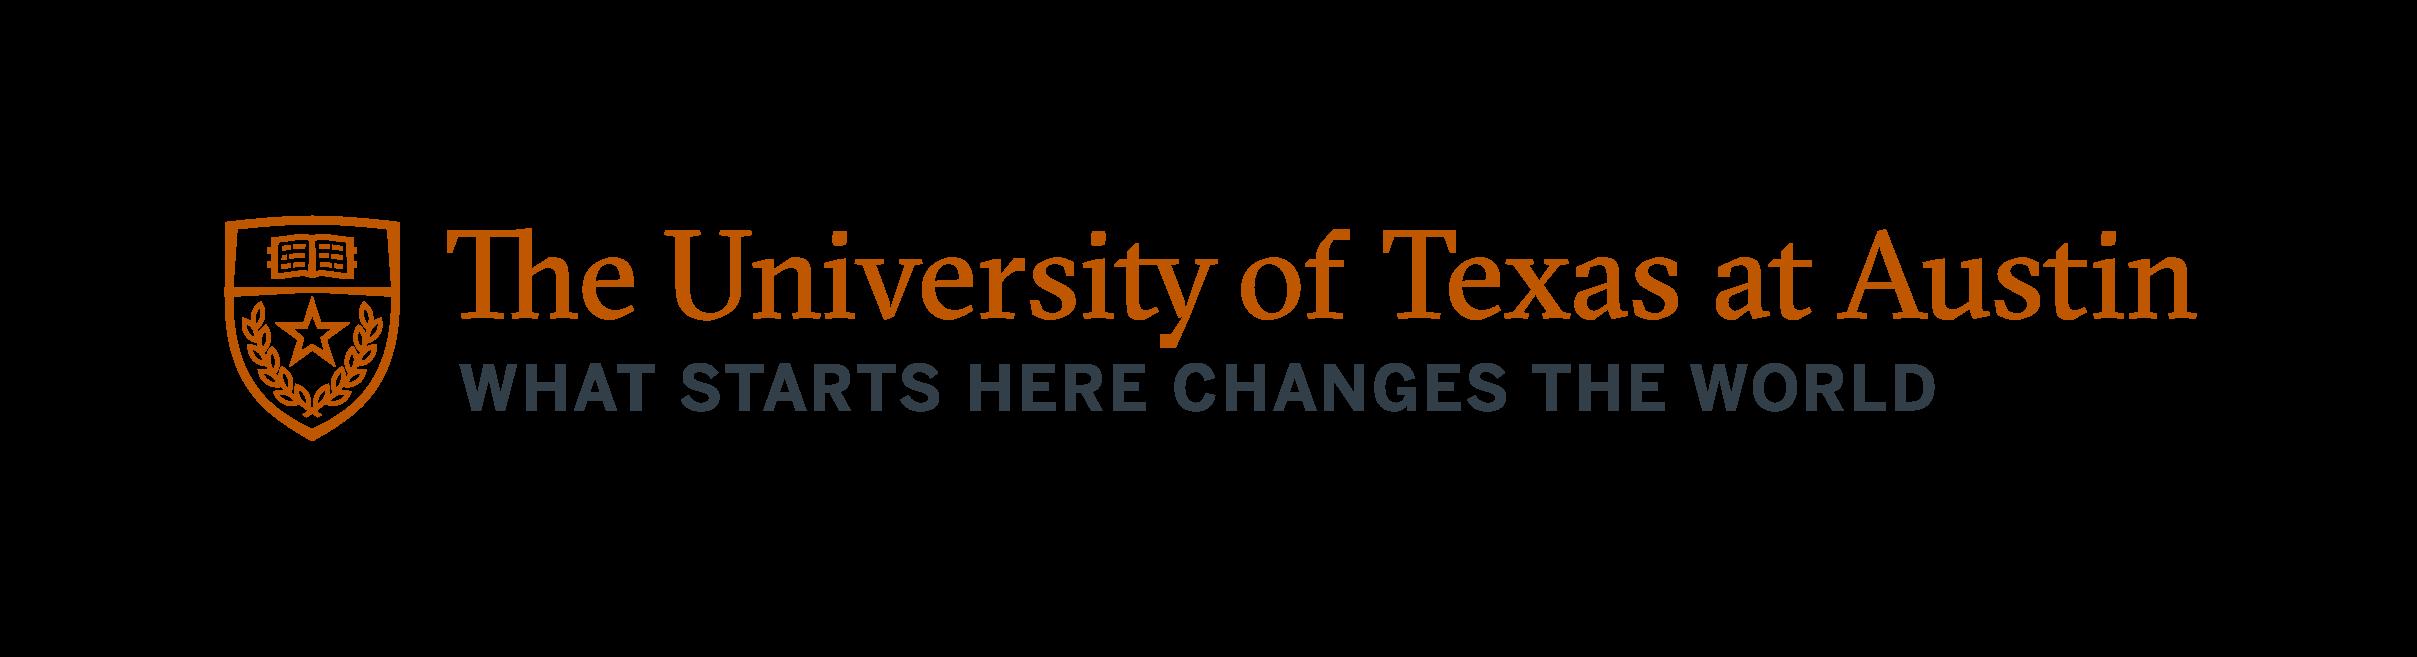 The University of Texas at Austin. UT Austin.